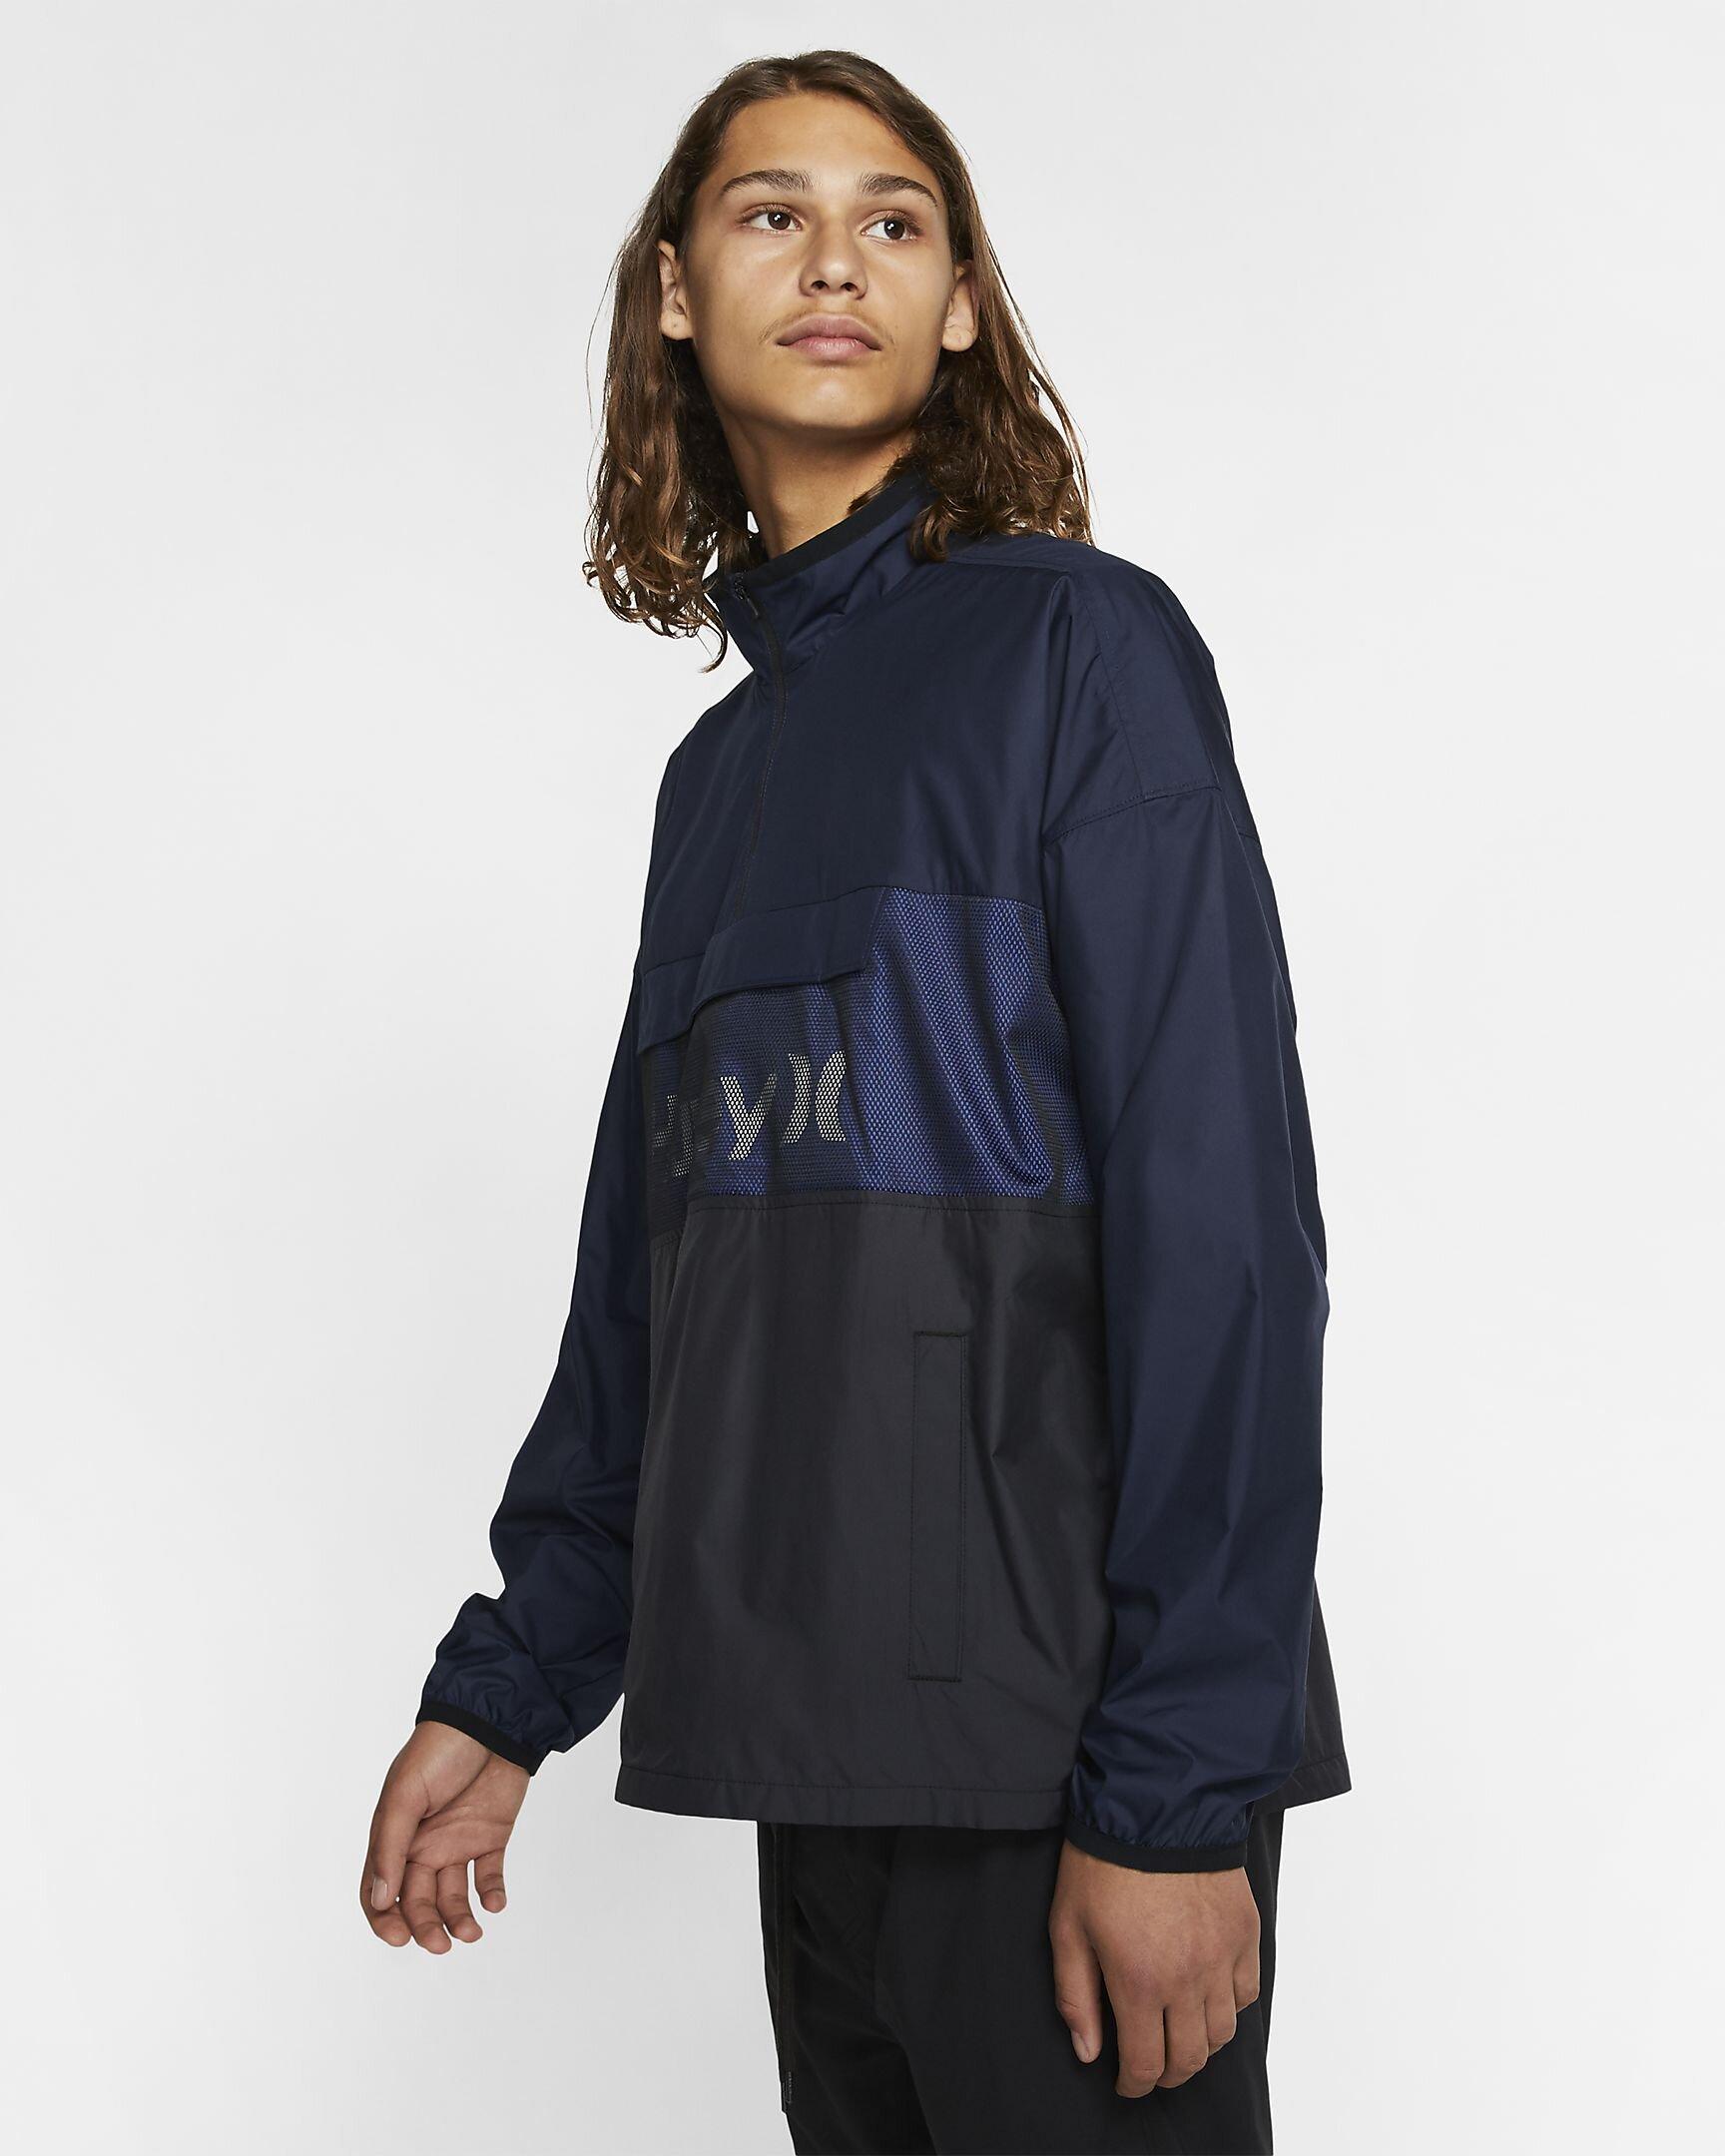 hurley-siege-anorak-mens-jacket-KVw8DS-3.jpg